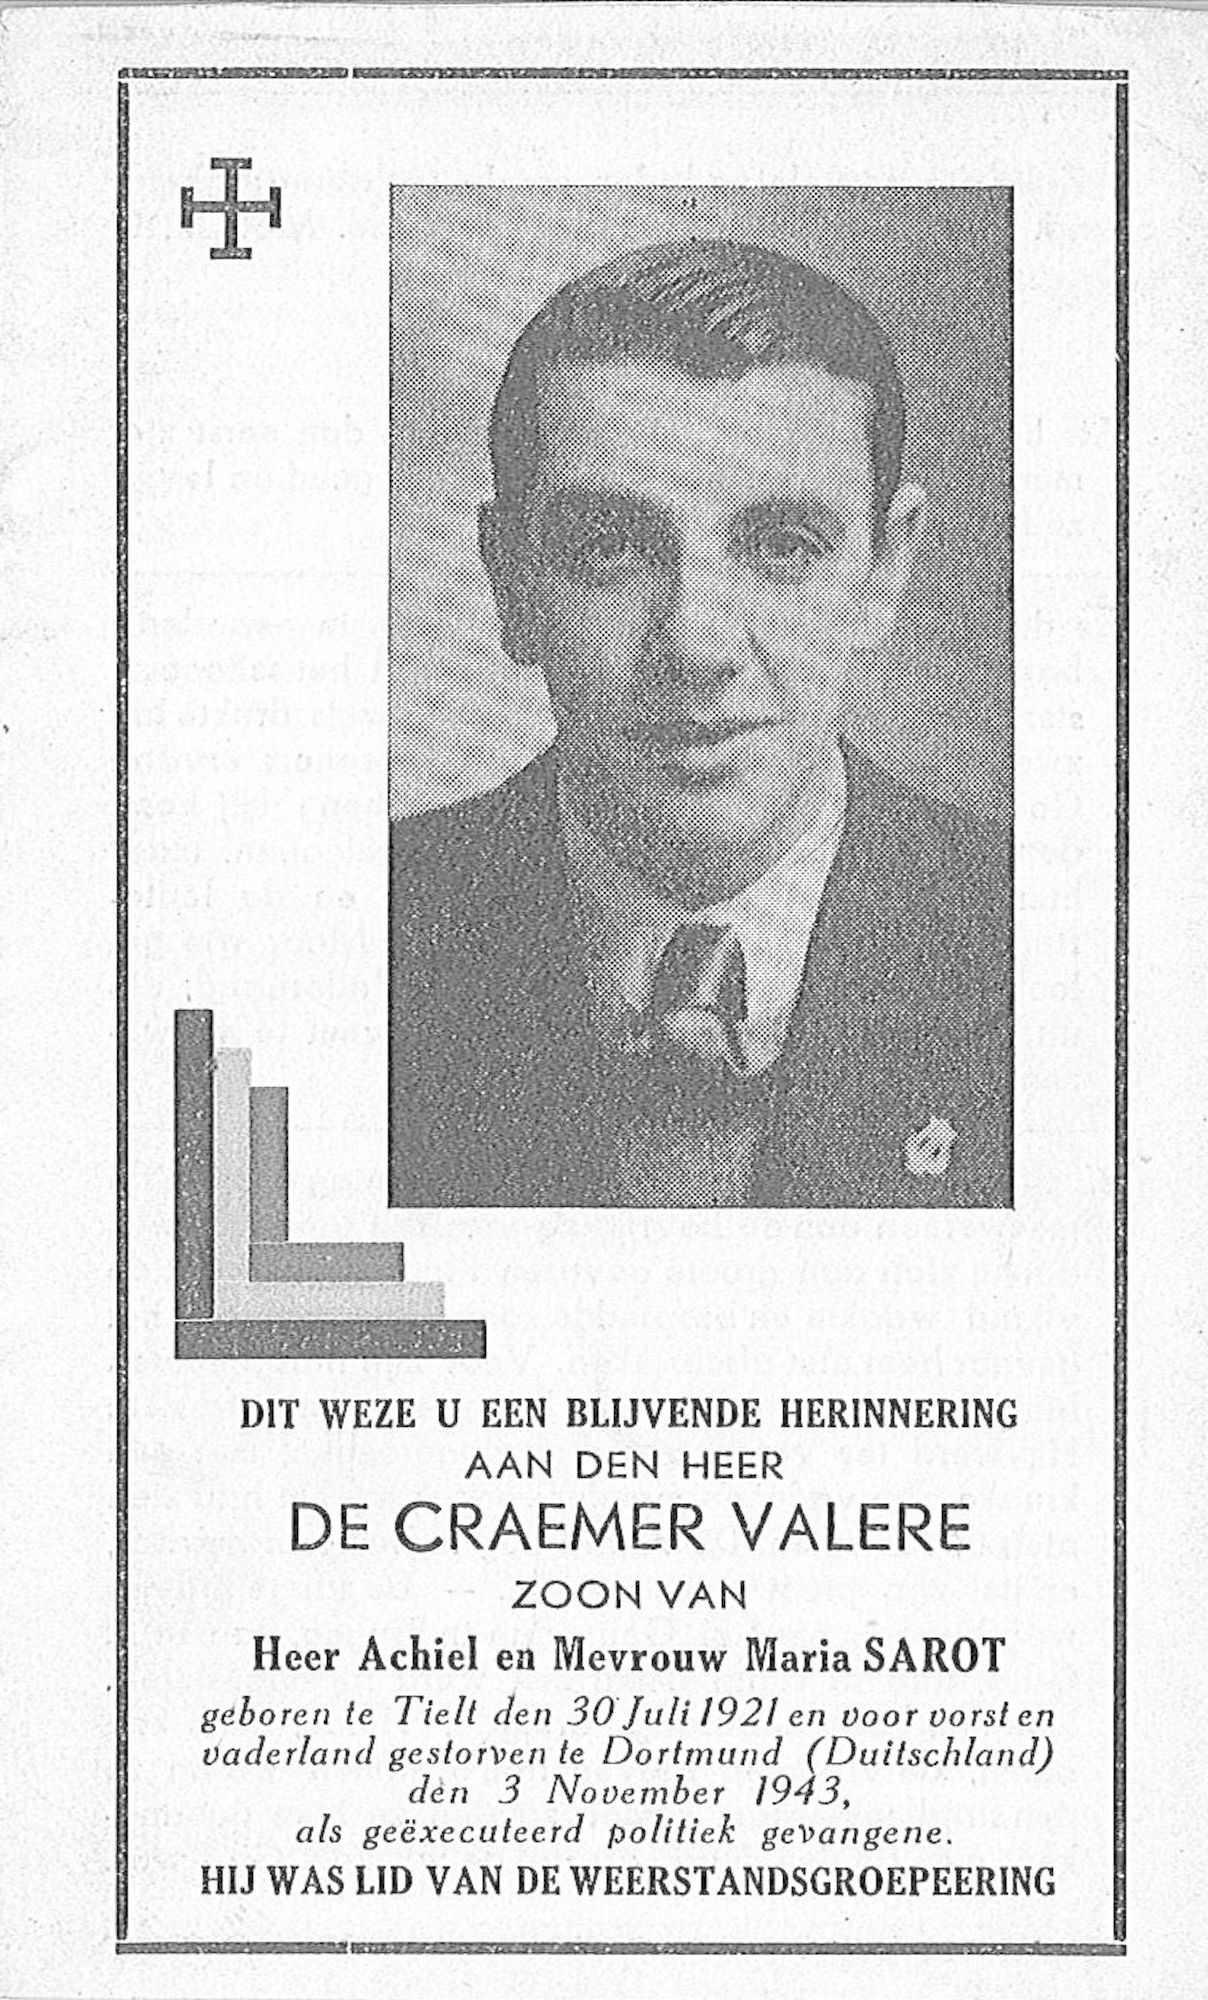 Valere De Craemer